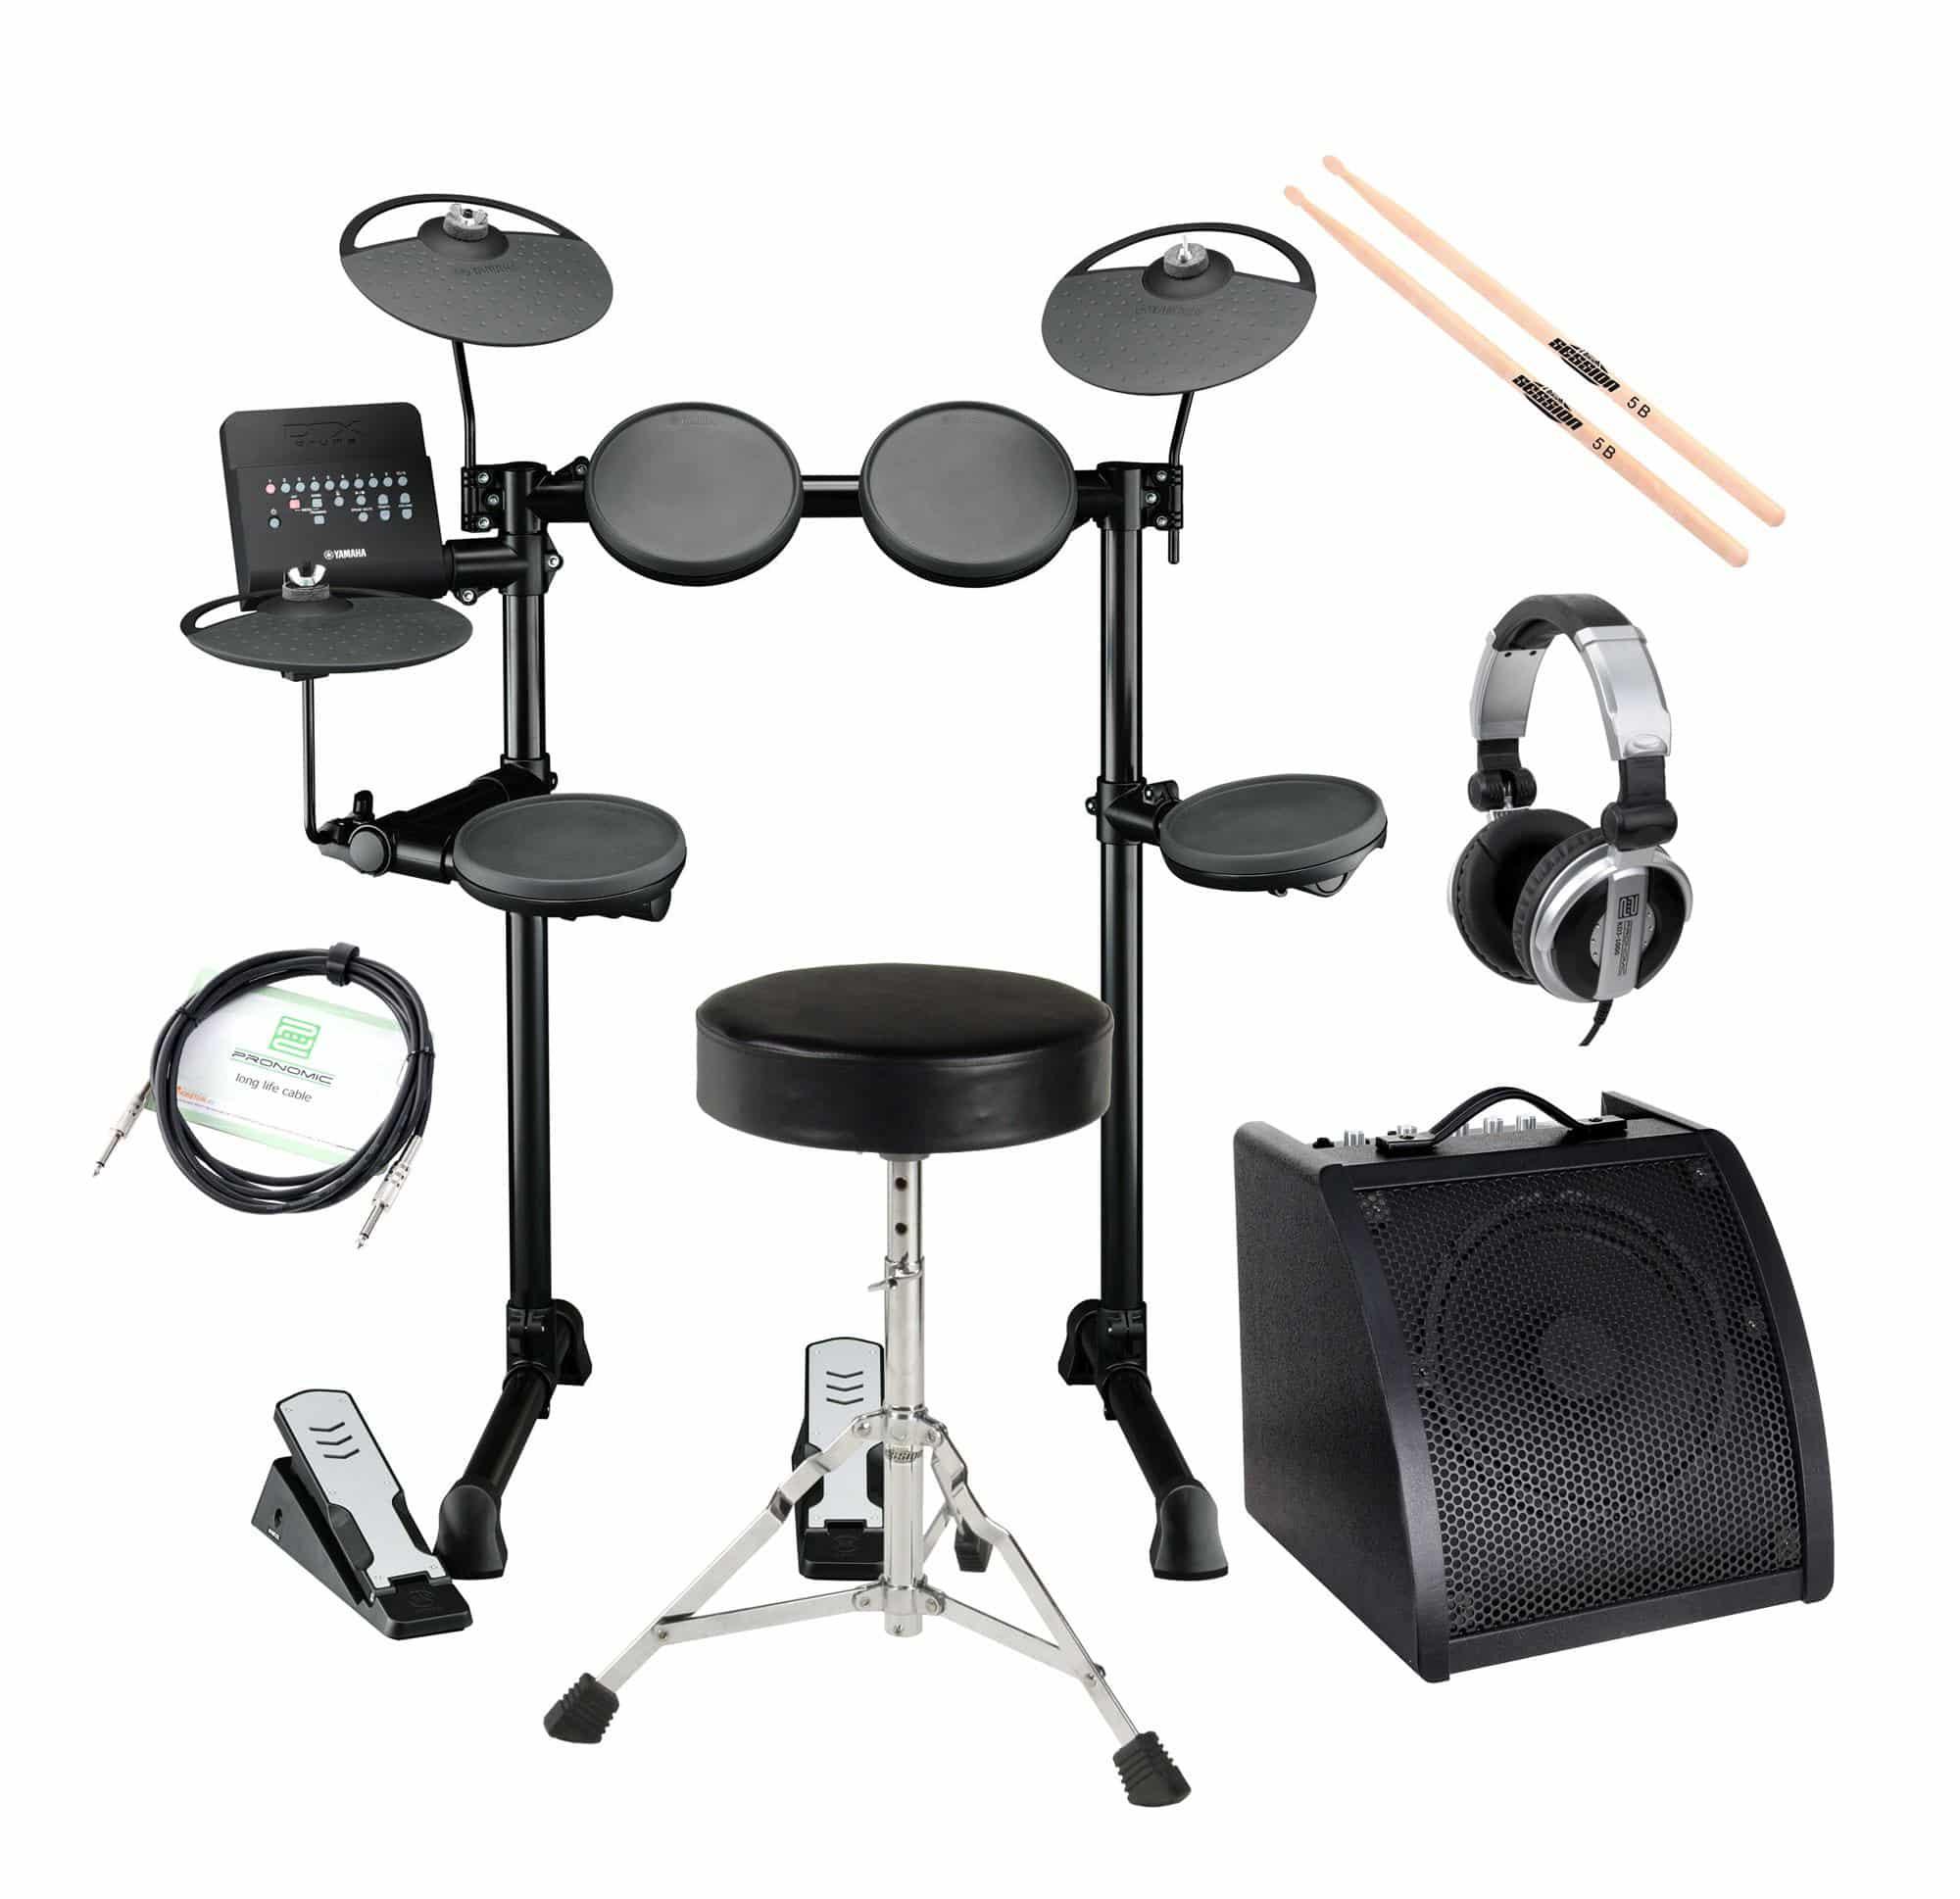 Yamaha DTX400K Compact E Drum SET inkl. Verstärker Kopfhörer Drumhocker Sticks